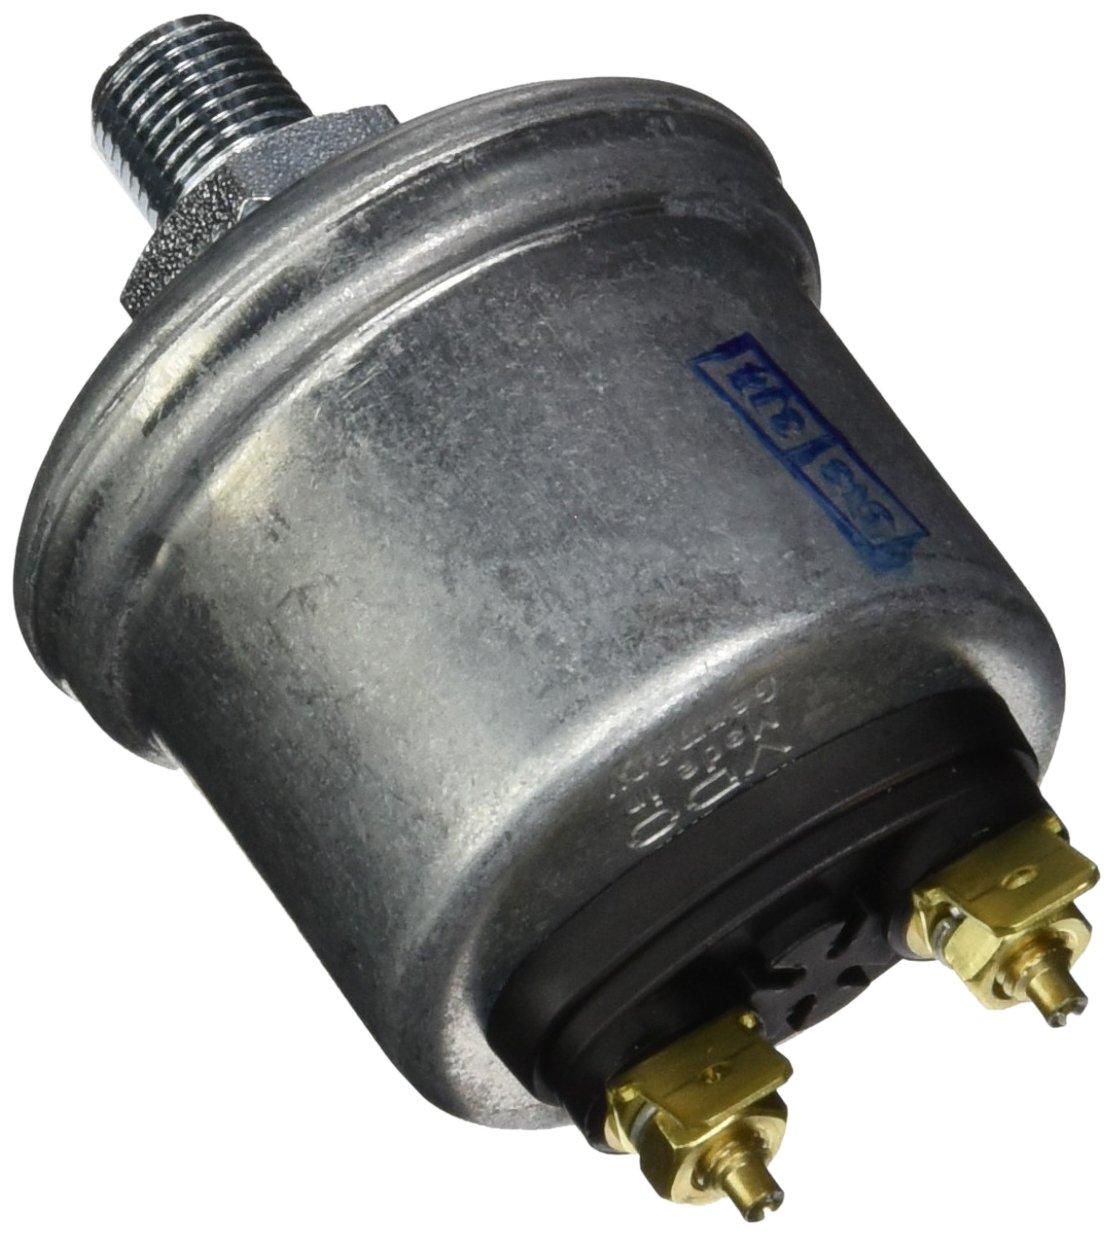 VDO 360 043 Gauge Pressure Sender by VDO